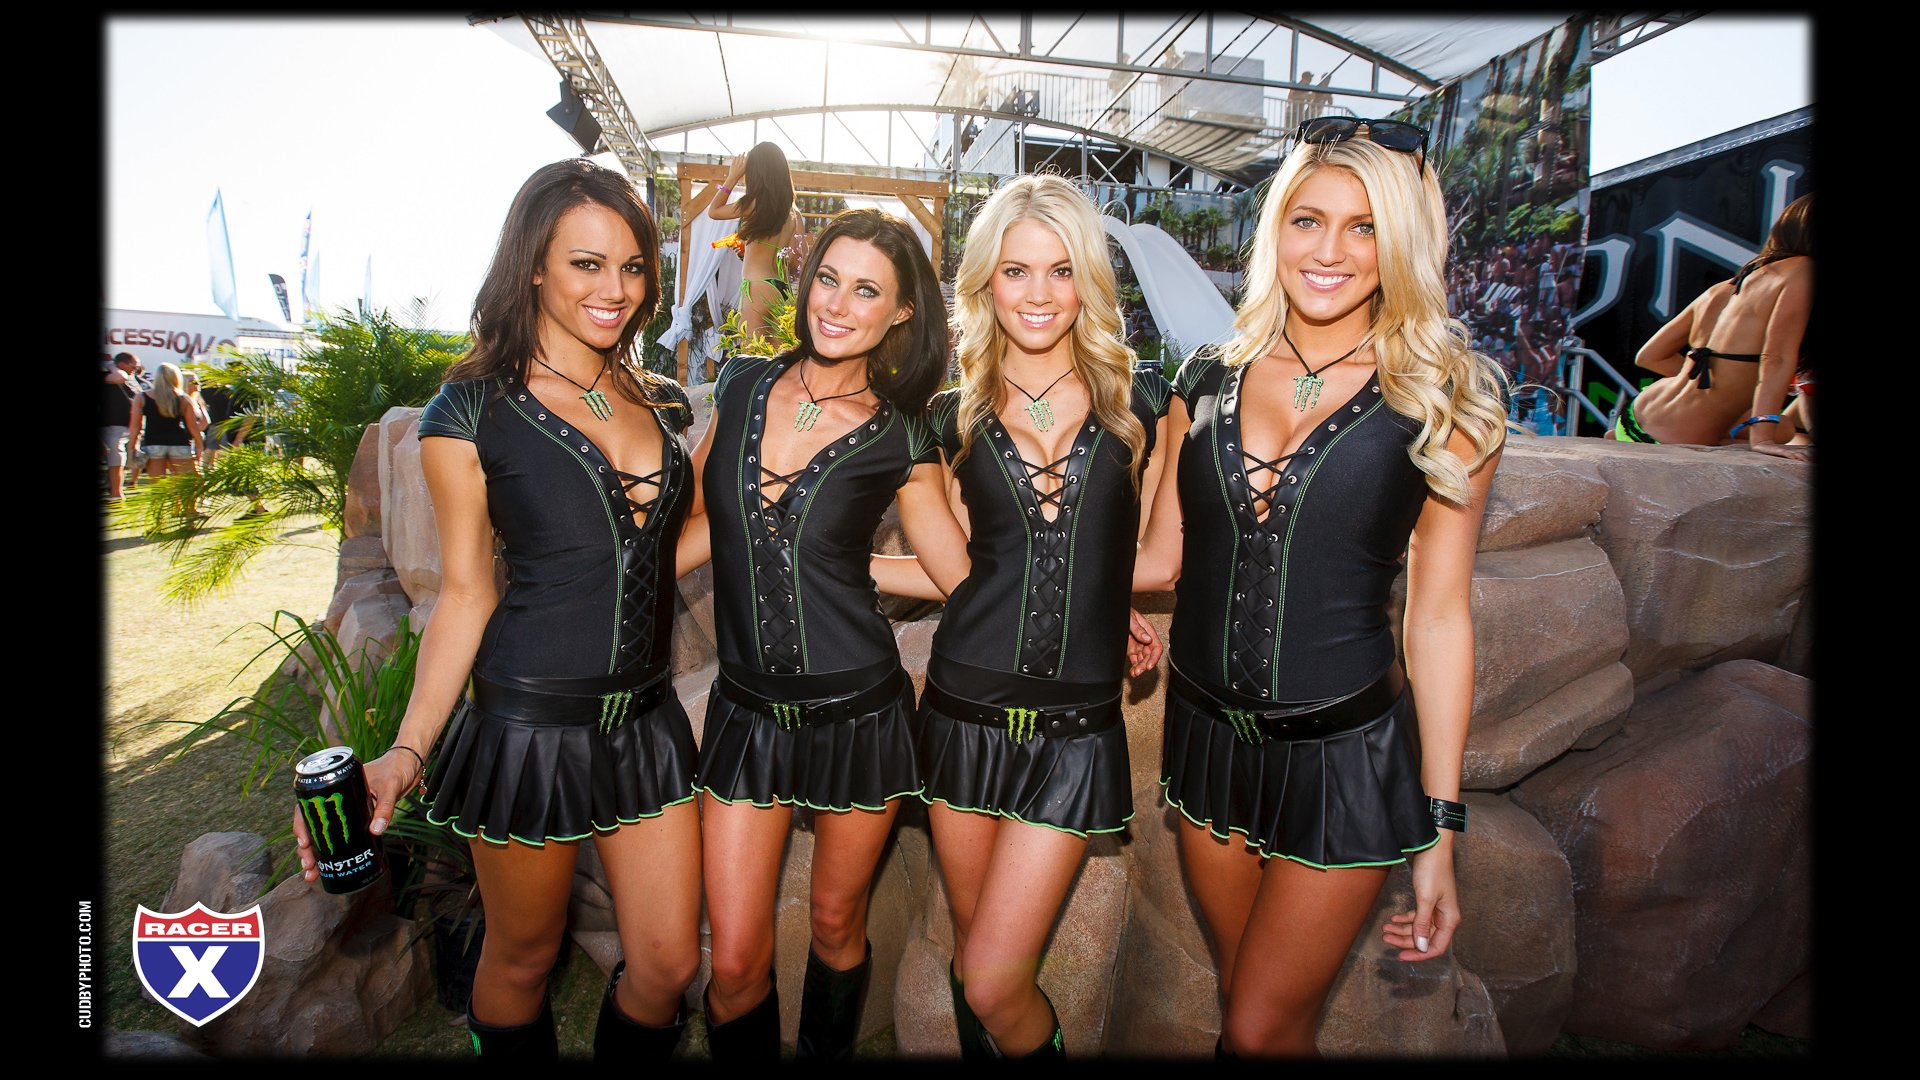 Vegas Wallpapers Supercross Racer X Online